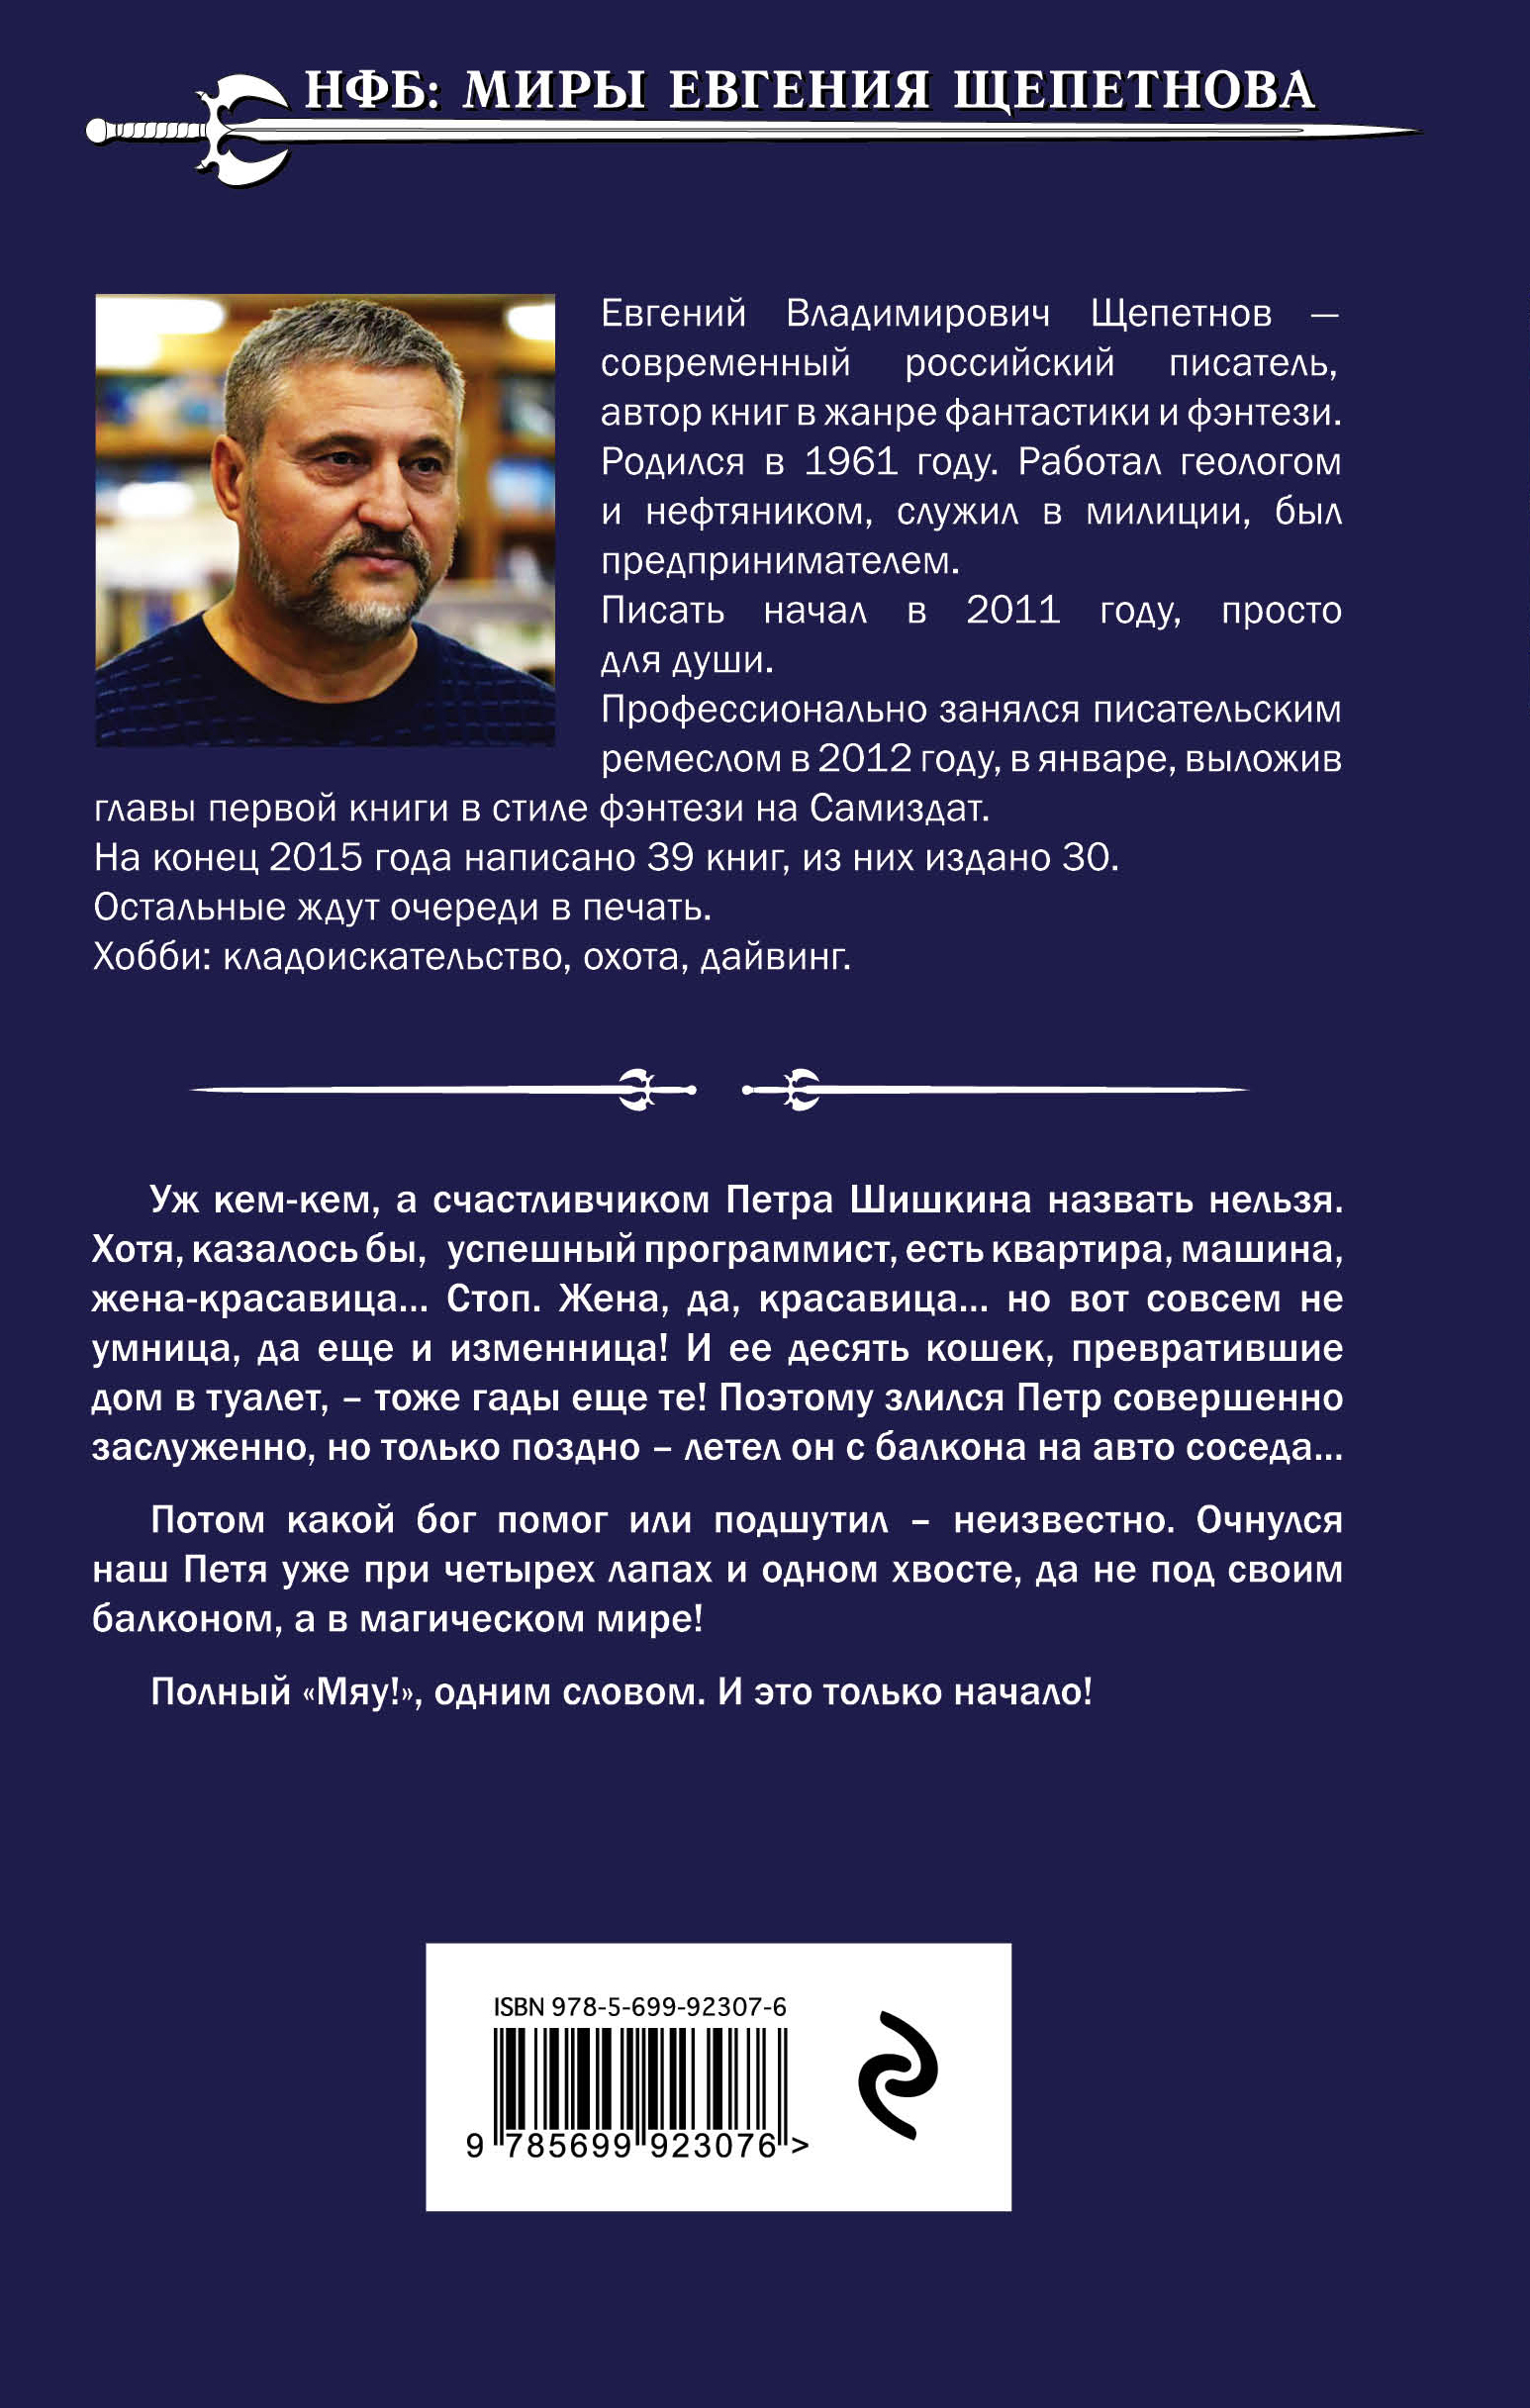 Тот, кто ходит сам по себе. Евгений Щепетнов